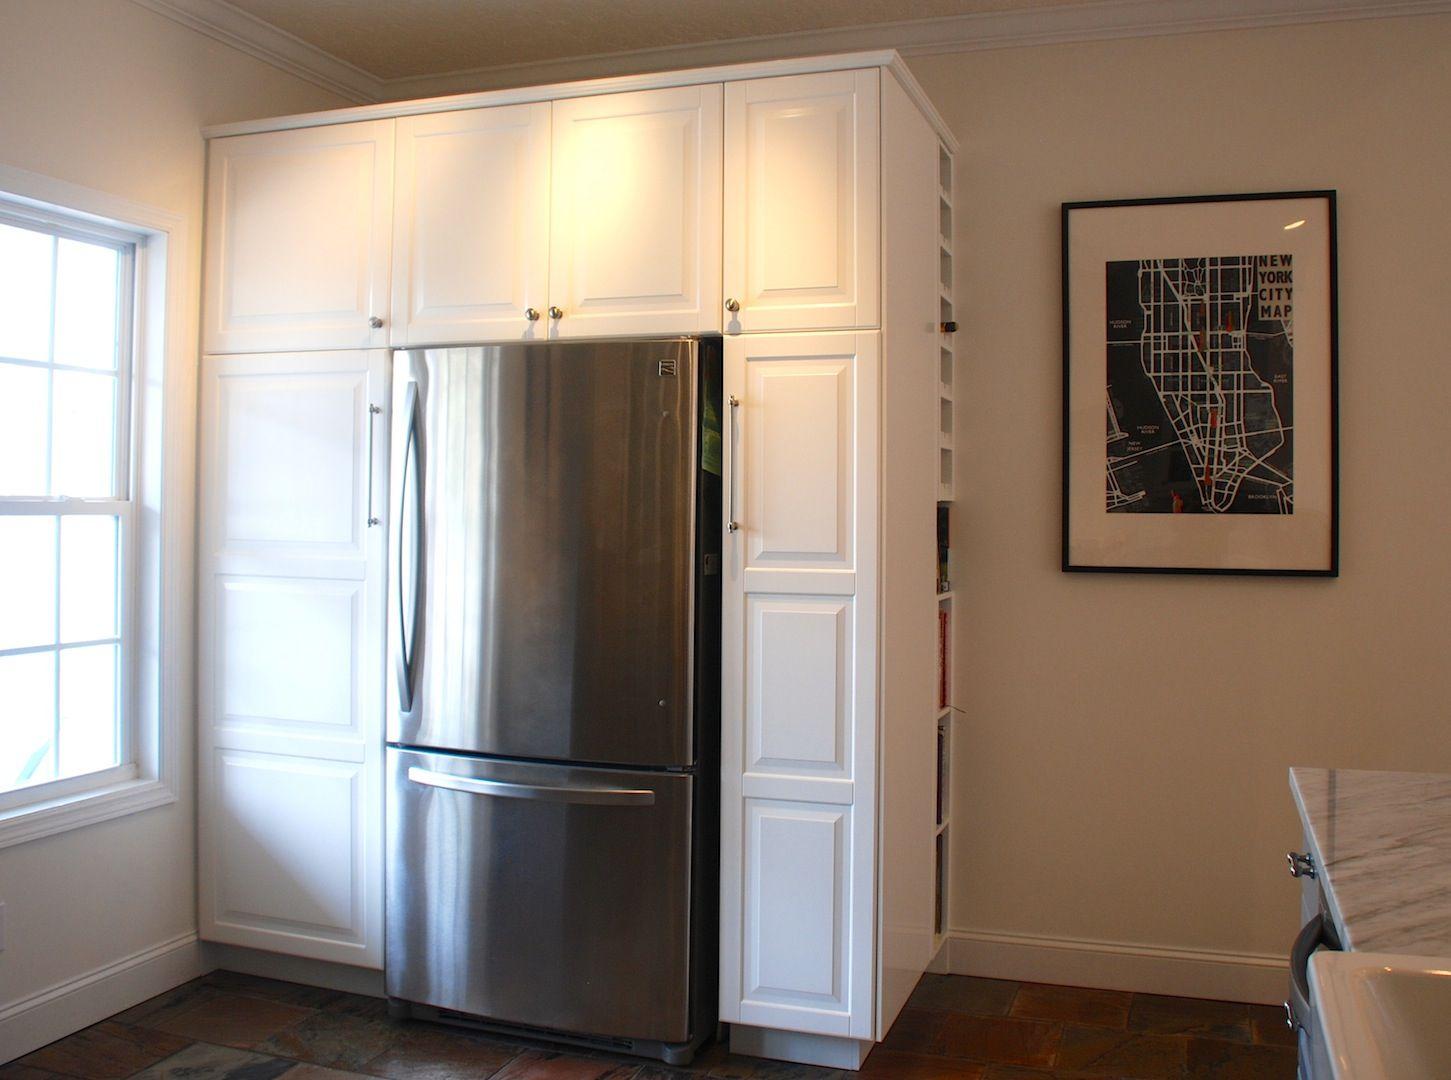 Best Ikea Lidingo White Pantry Surround With Ikea Hack Wine 400 x 300